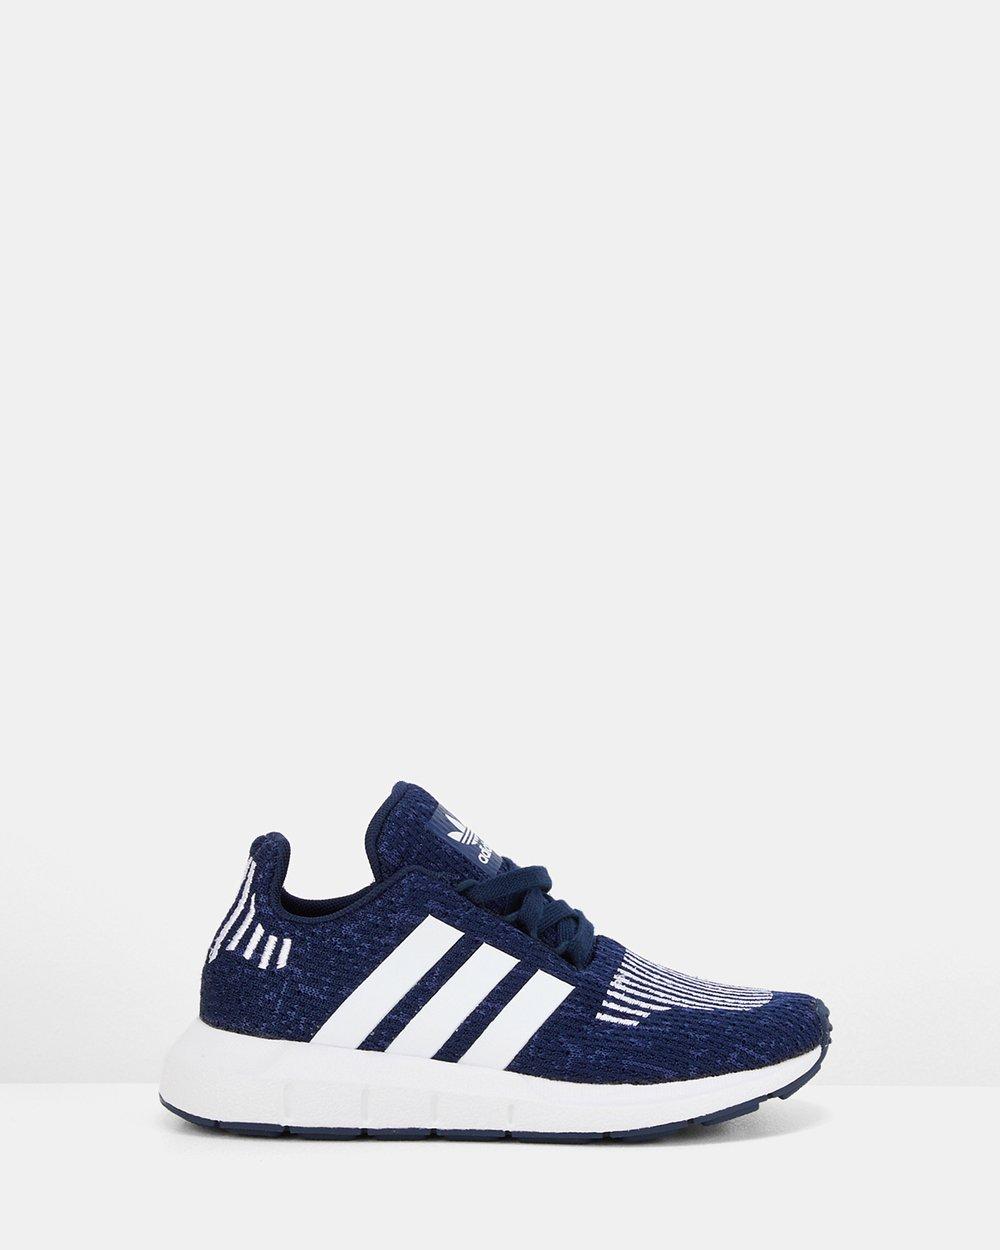 fce17dc98 Swift Run Pre School Boys by adidas Originals Online